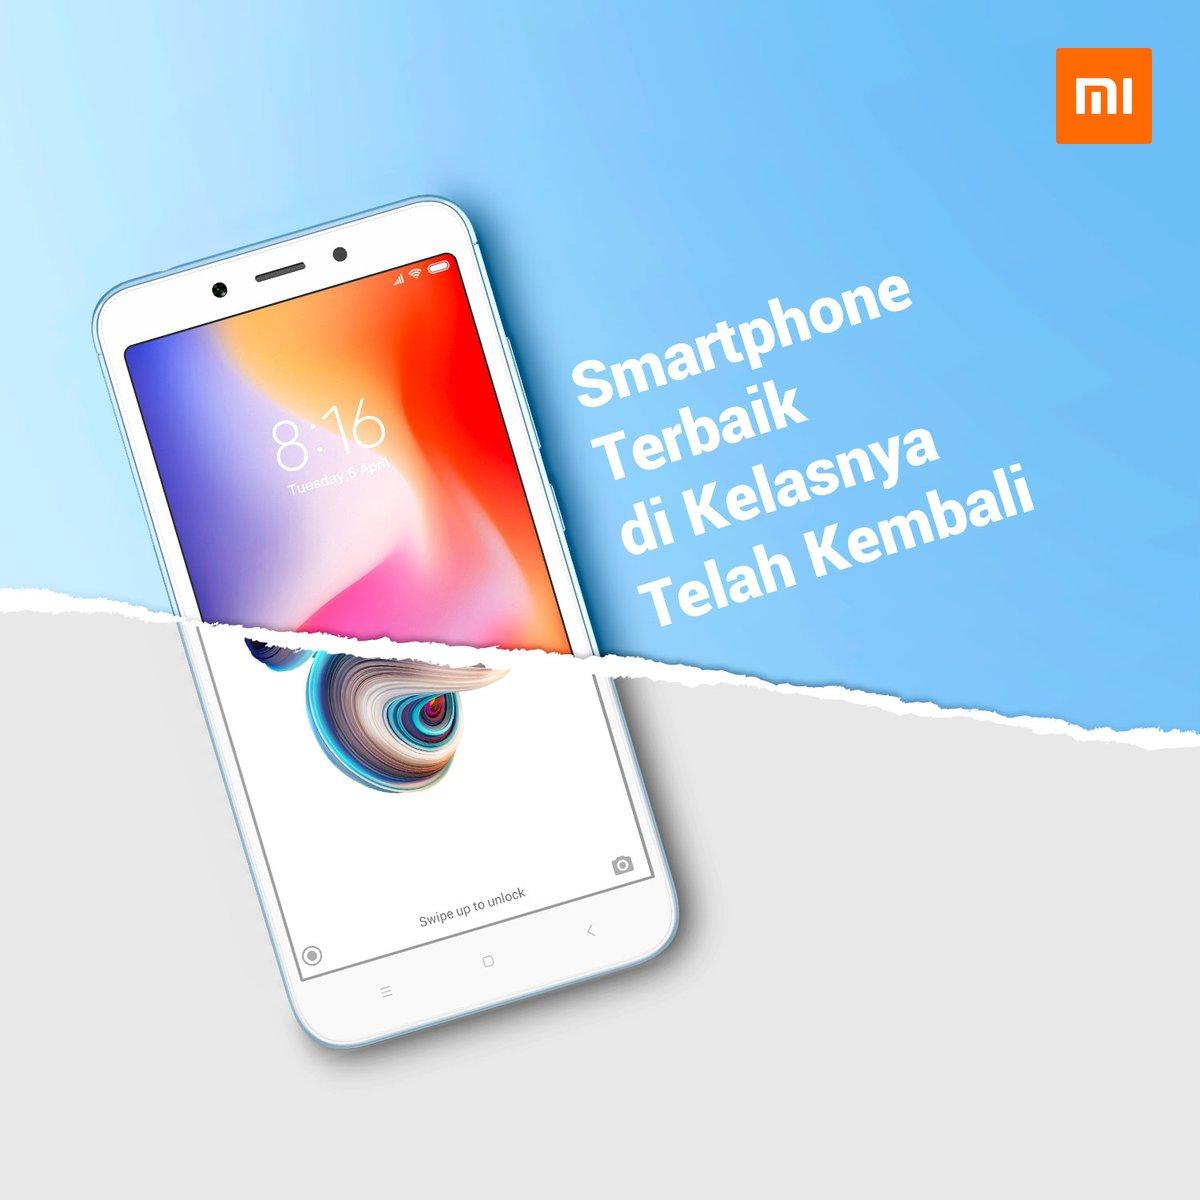 Xiaomi Redmi 6A Segera Hadir di Indonesia, Siap Teruskan Kesuksesan Redmi 5A! 7